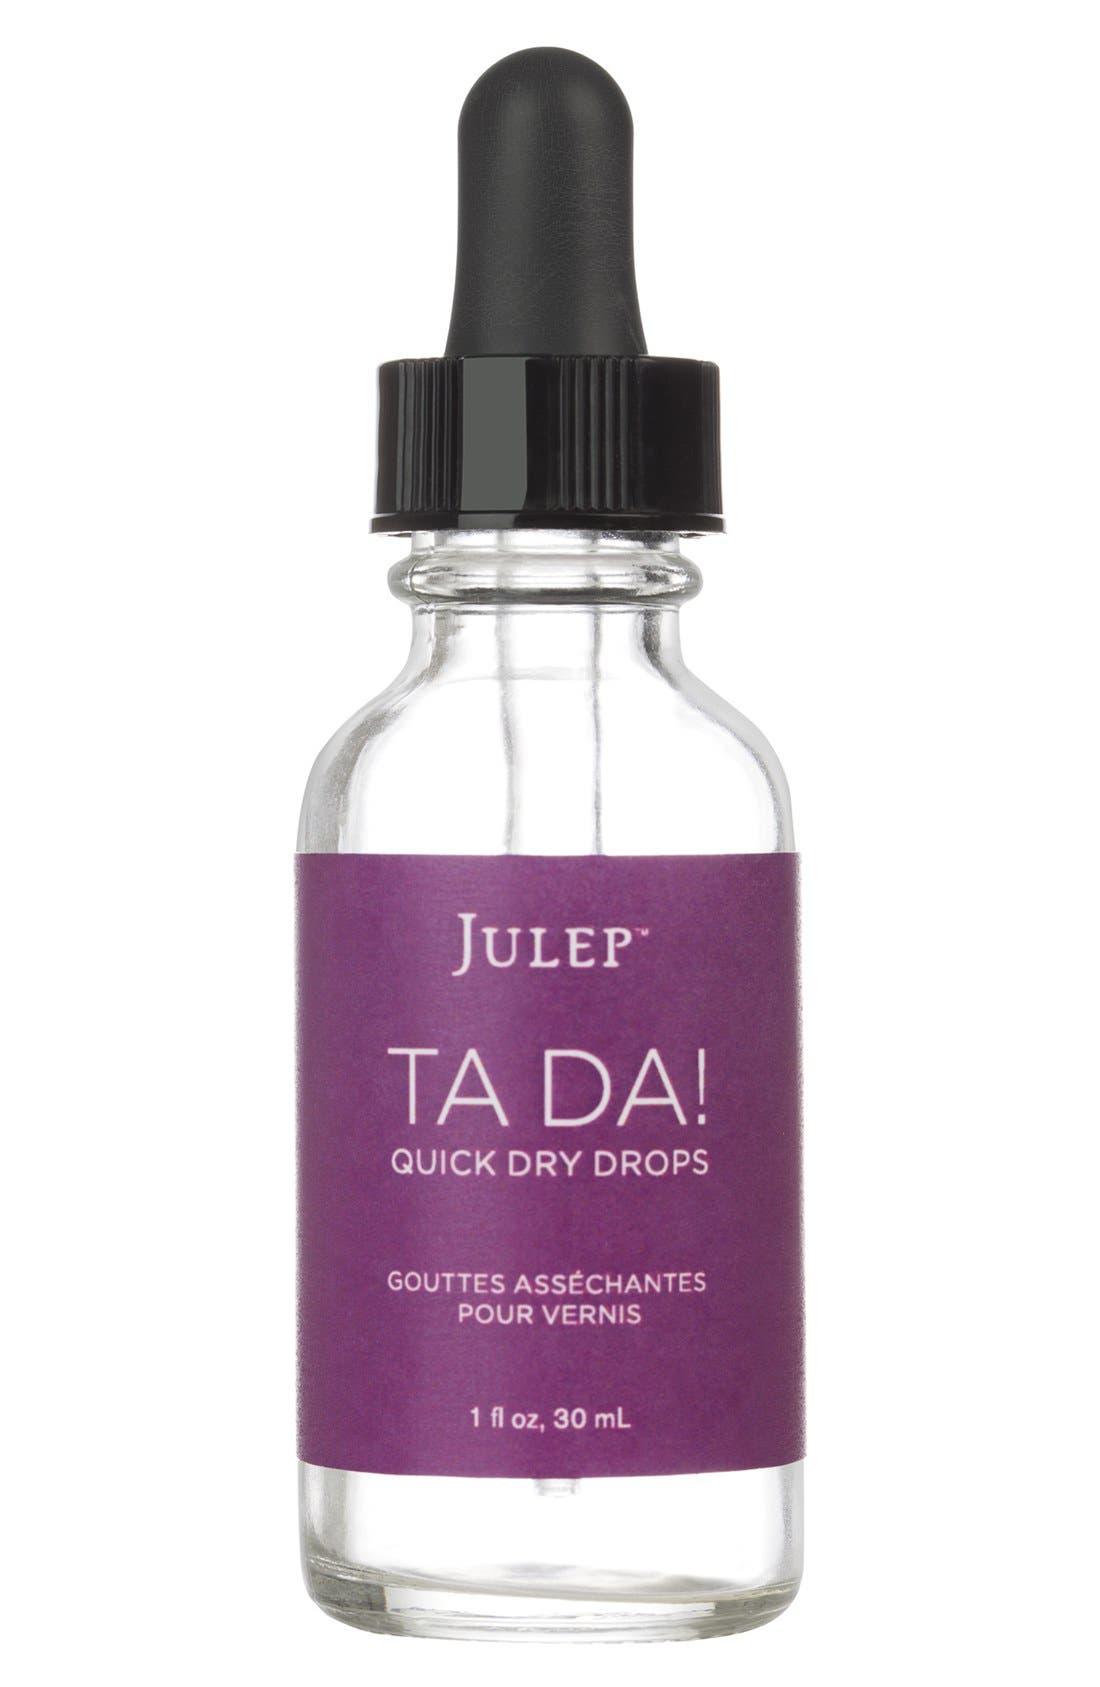 Julep™ Ta-Da Quick Dry Polish Drops